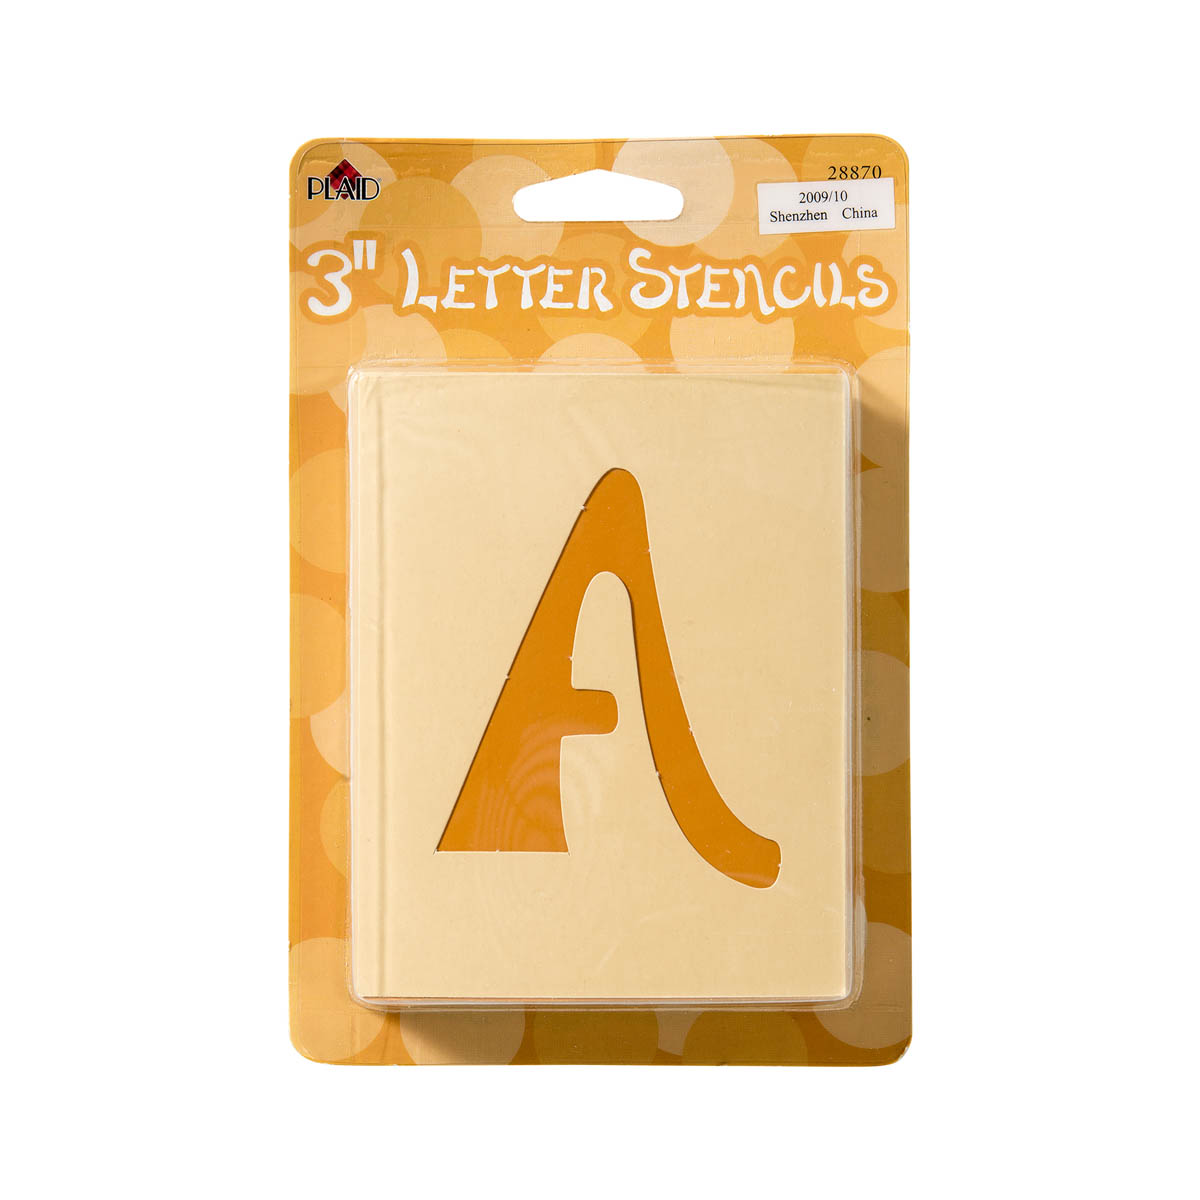 Plaid ® Stencils - Value Packs - Letter Stencils - Swashbuckle - 28870